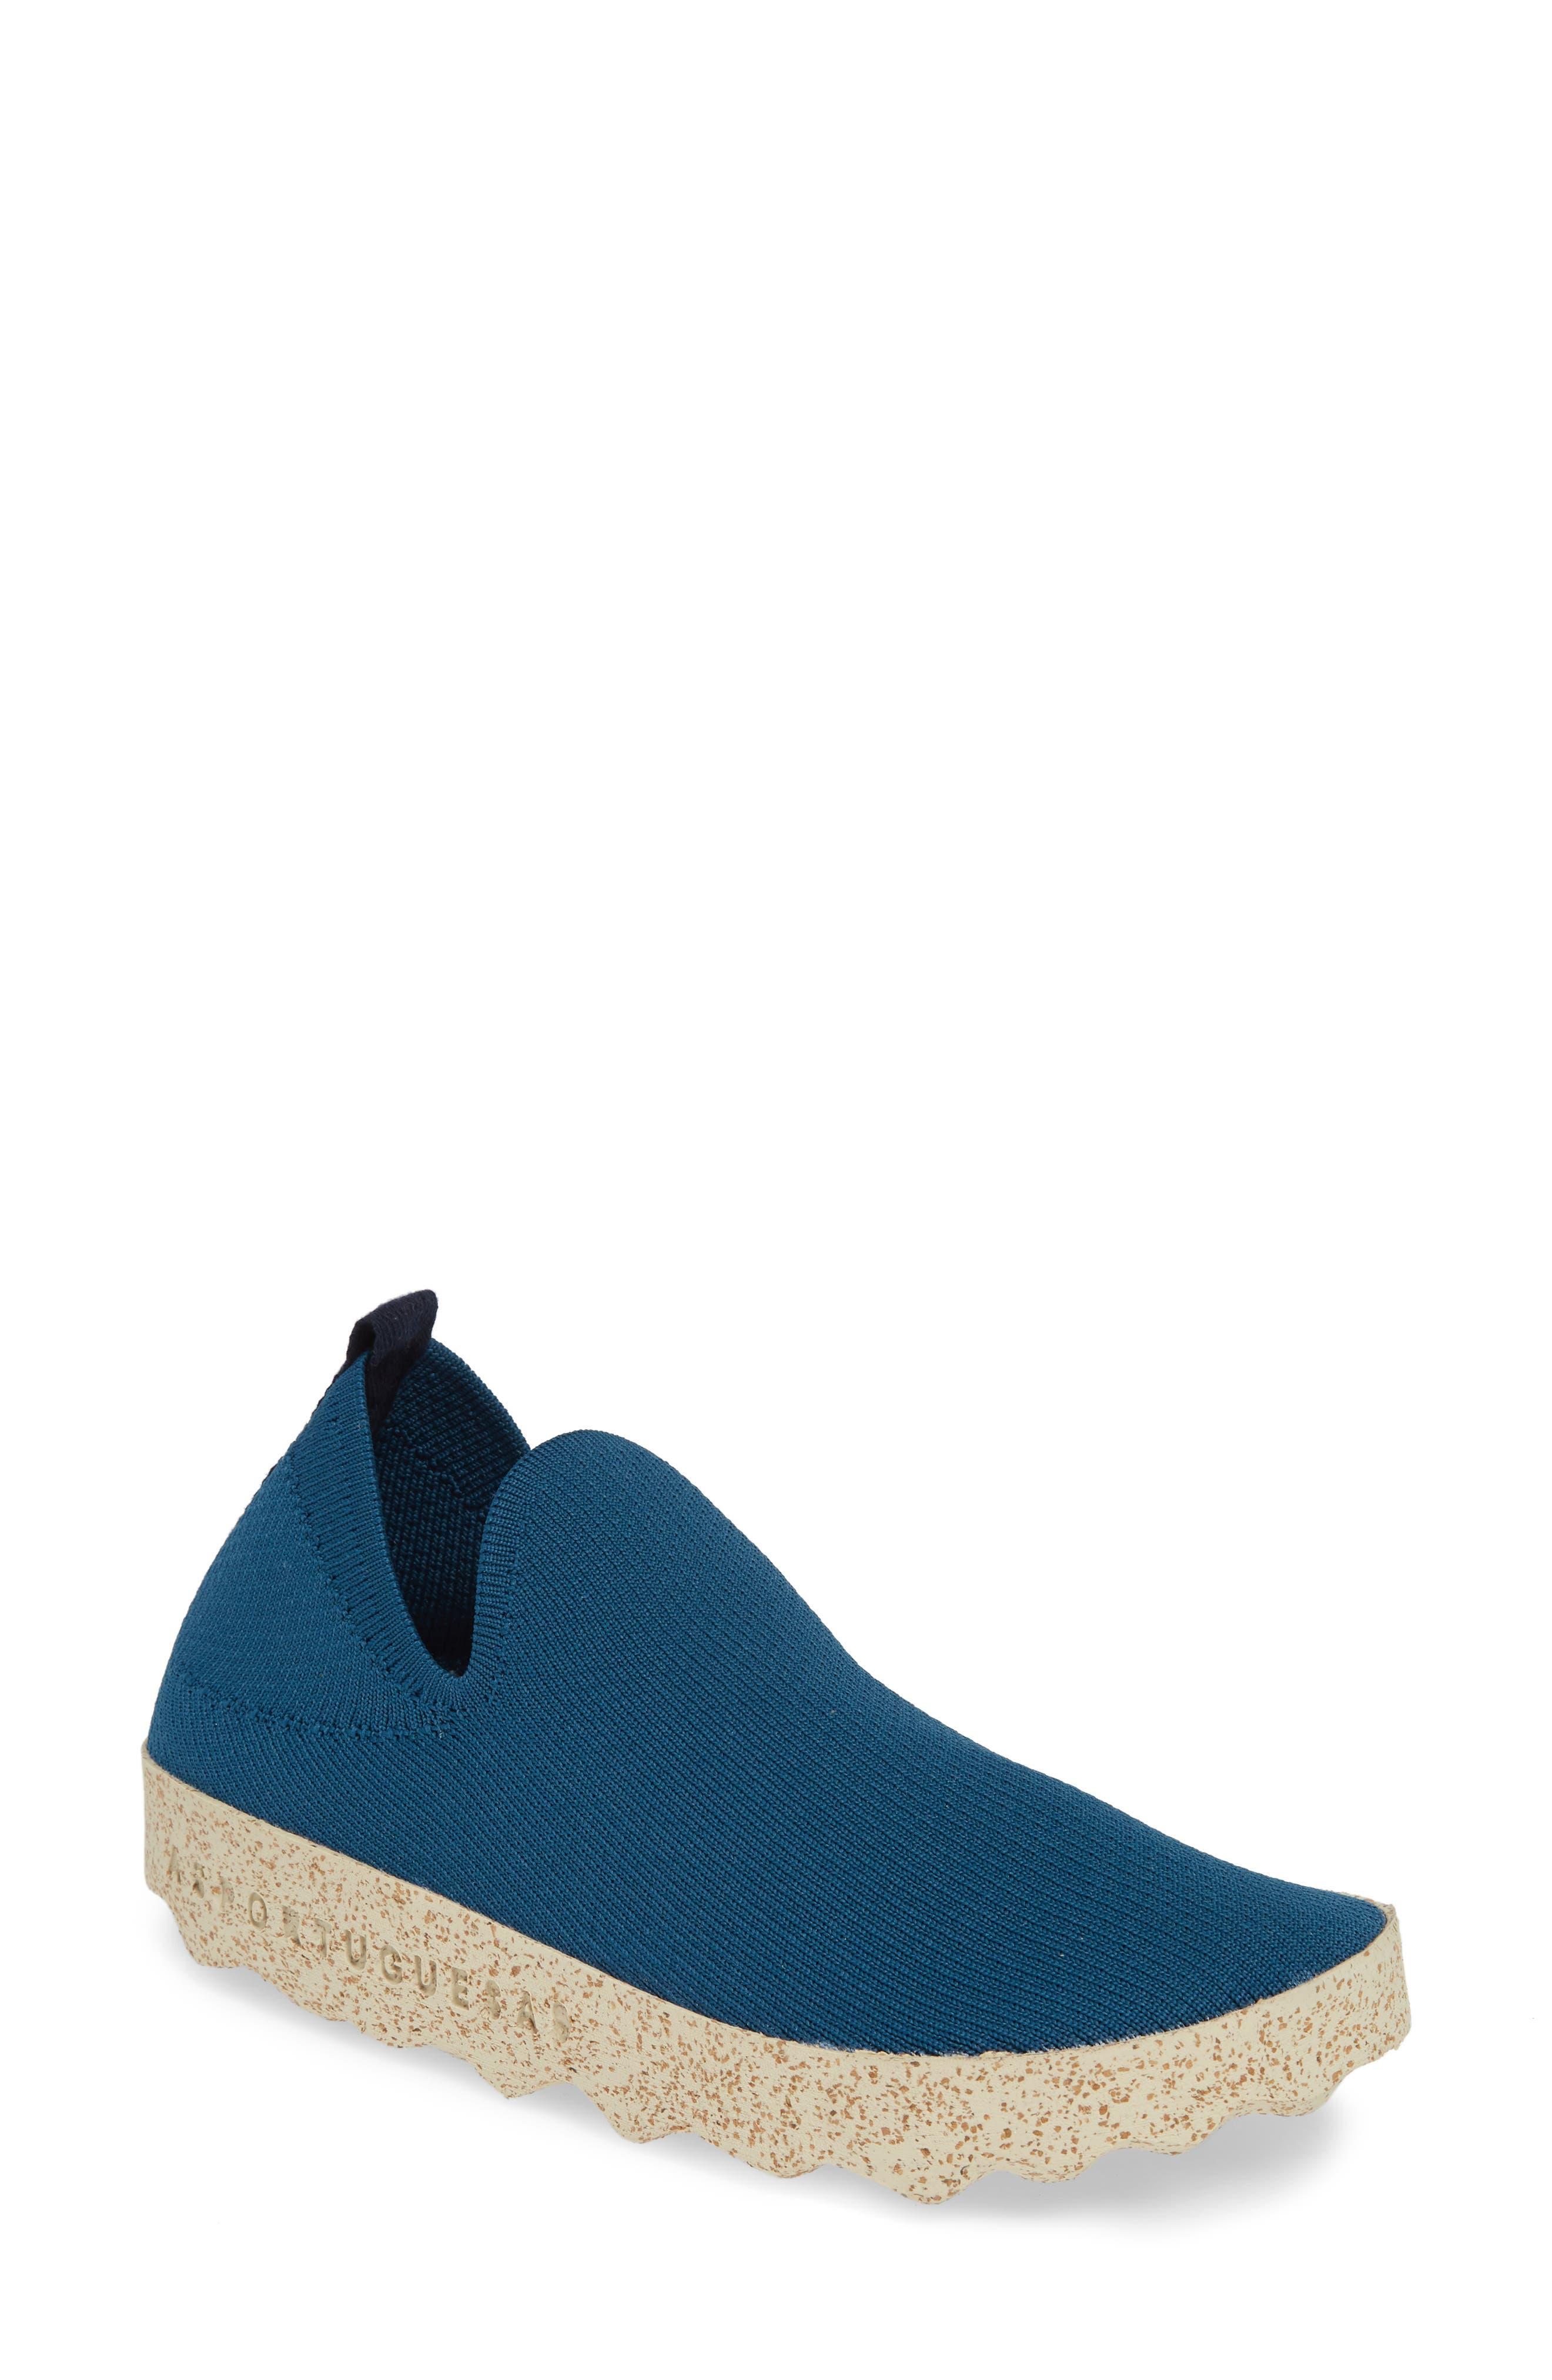 Asportuguesas By Fly London Care Sneaker, Blue